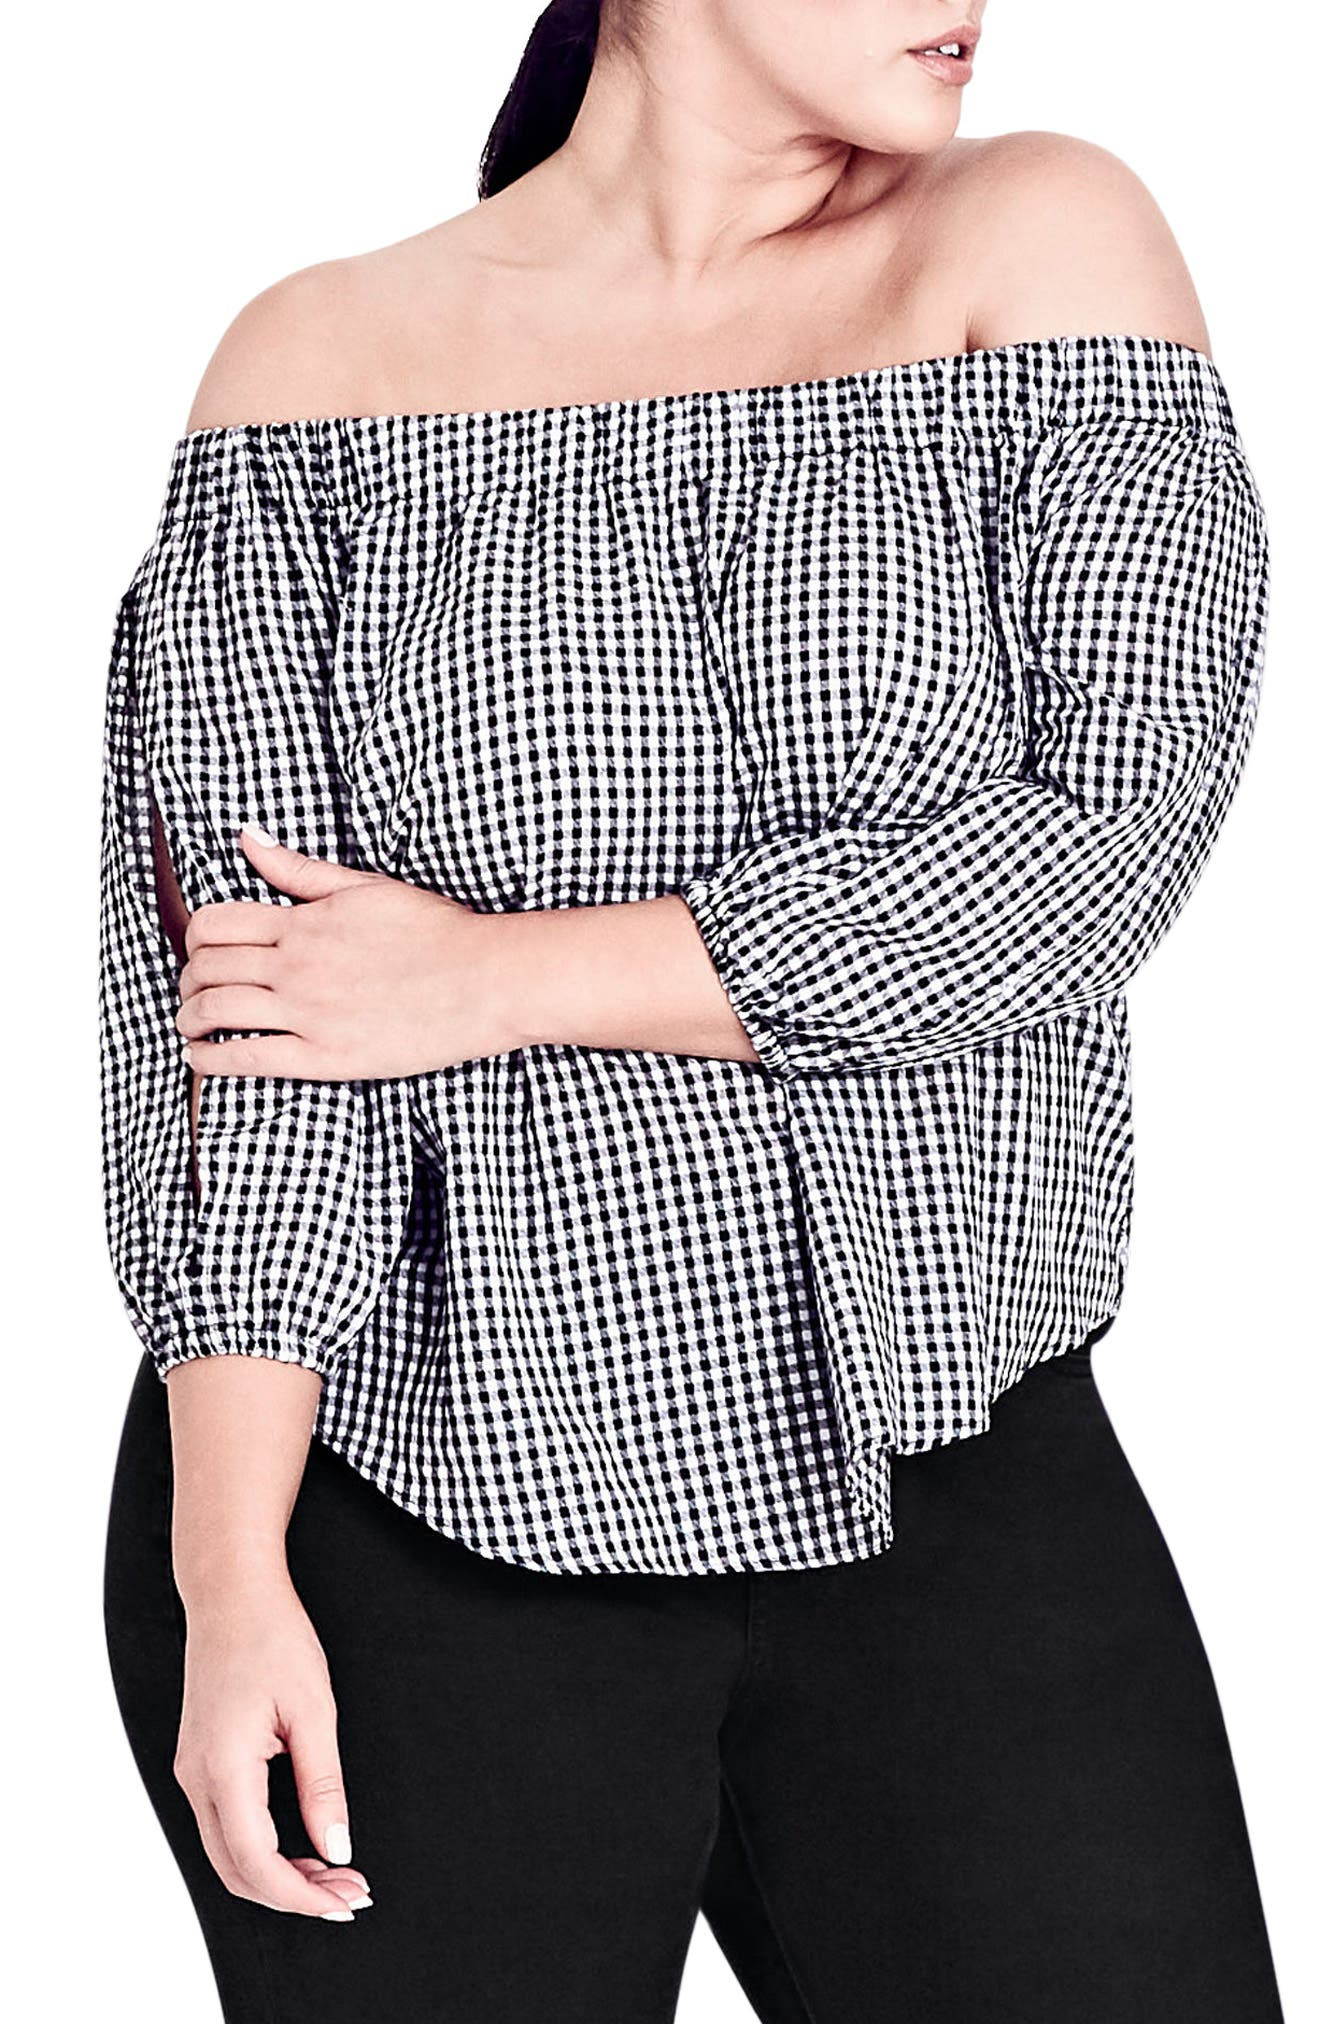 Gingham Off the Shoulder Top,                         Main,                         color, Black / White